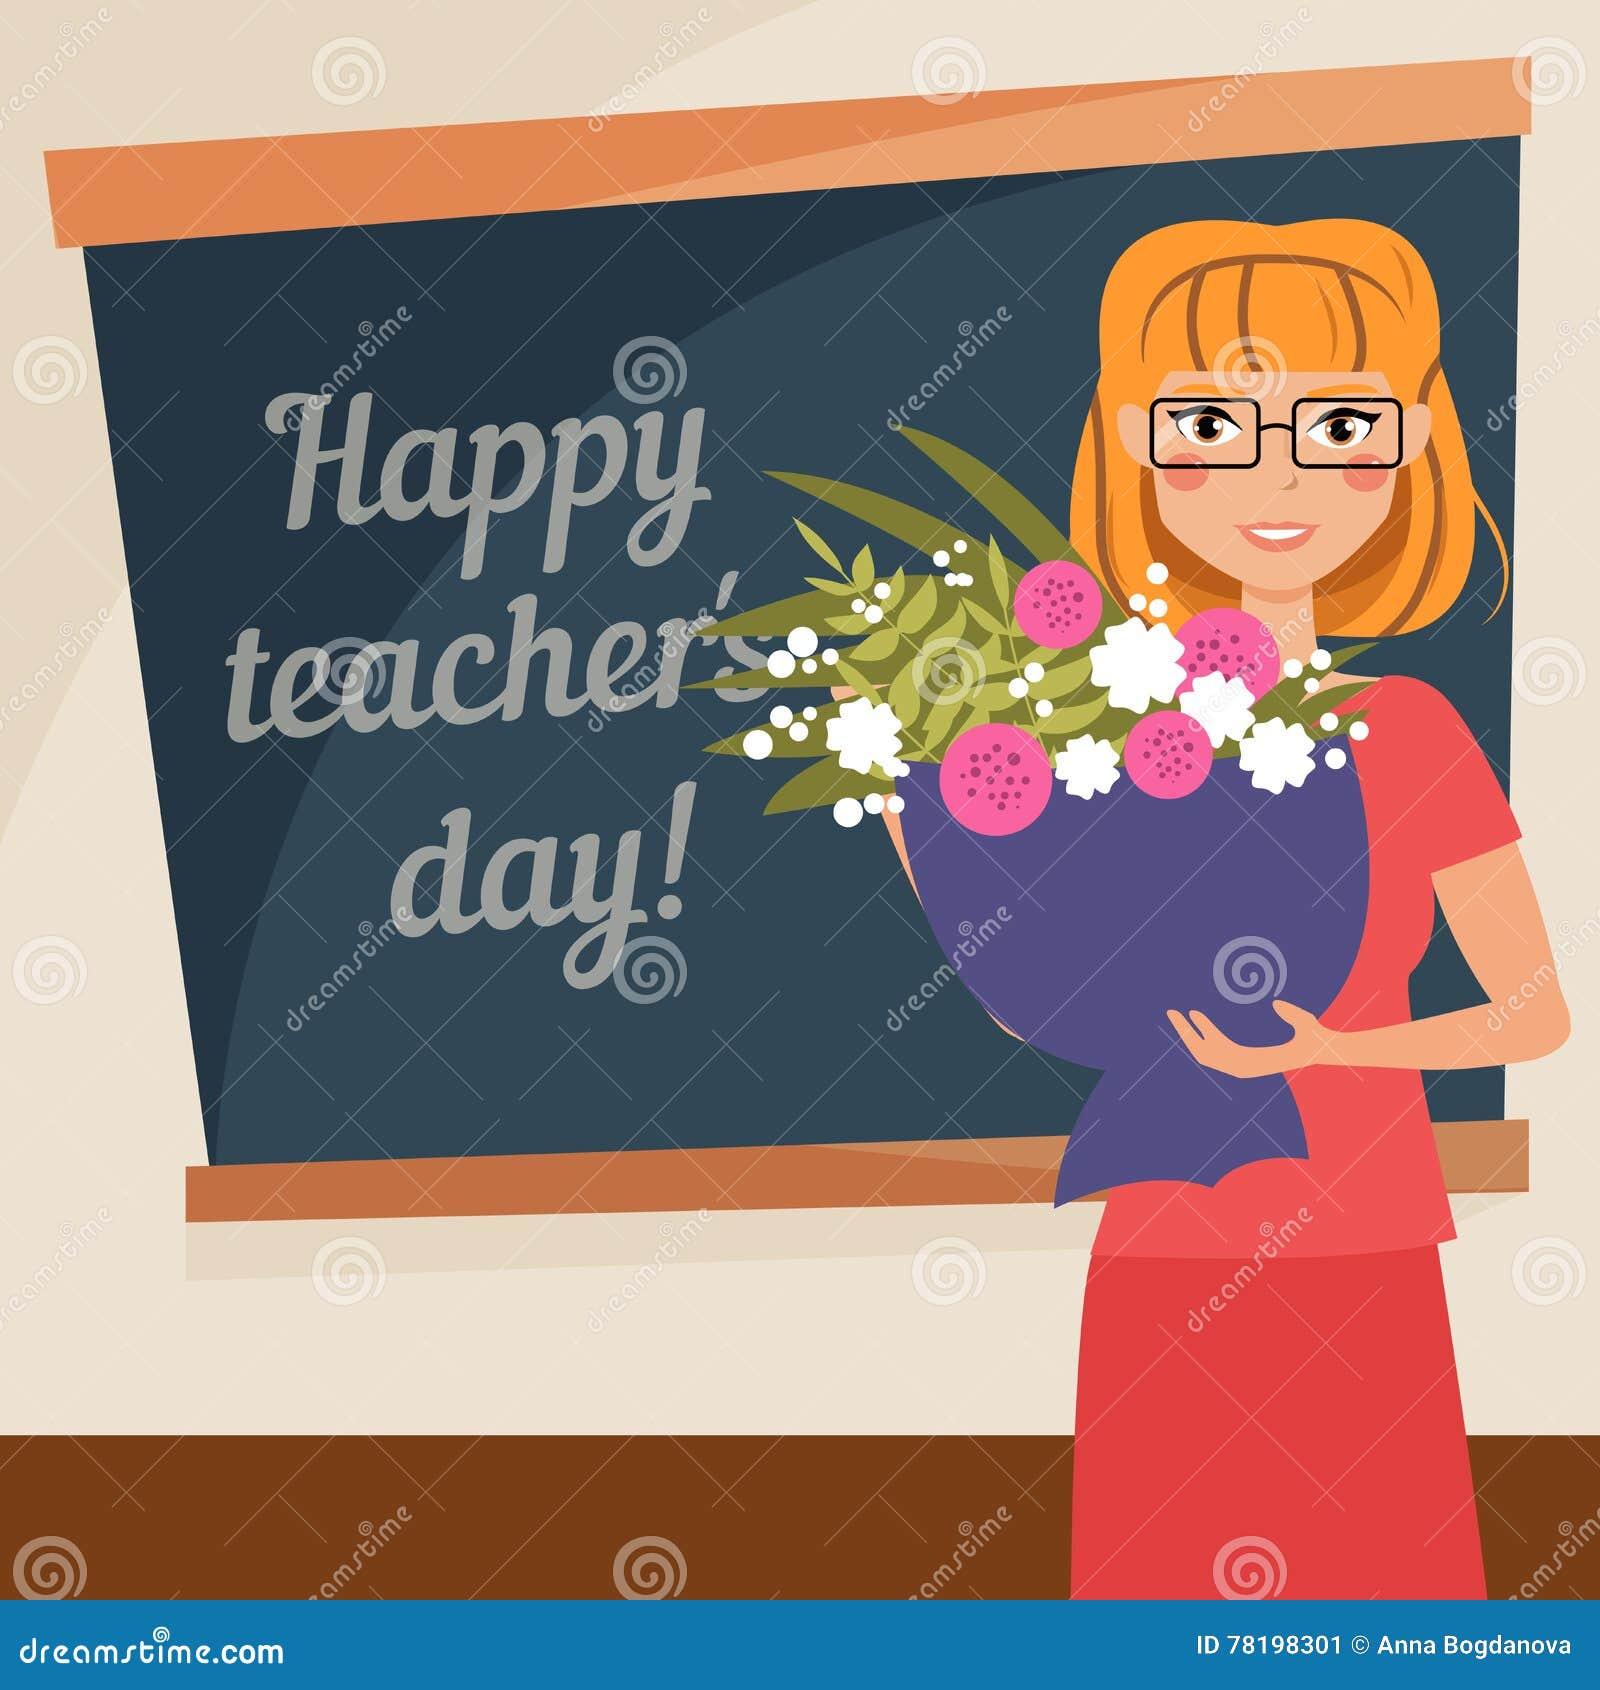 Happy Teachers Day Cards Designs